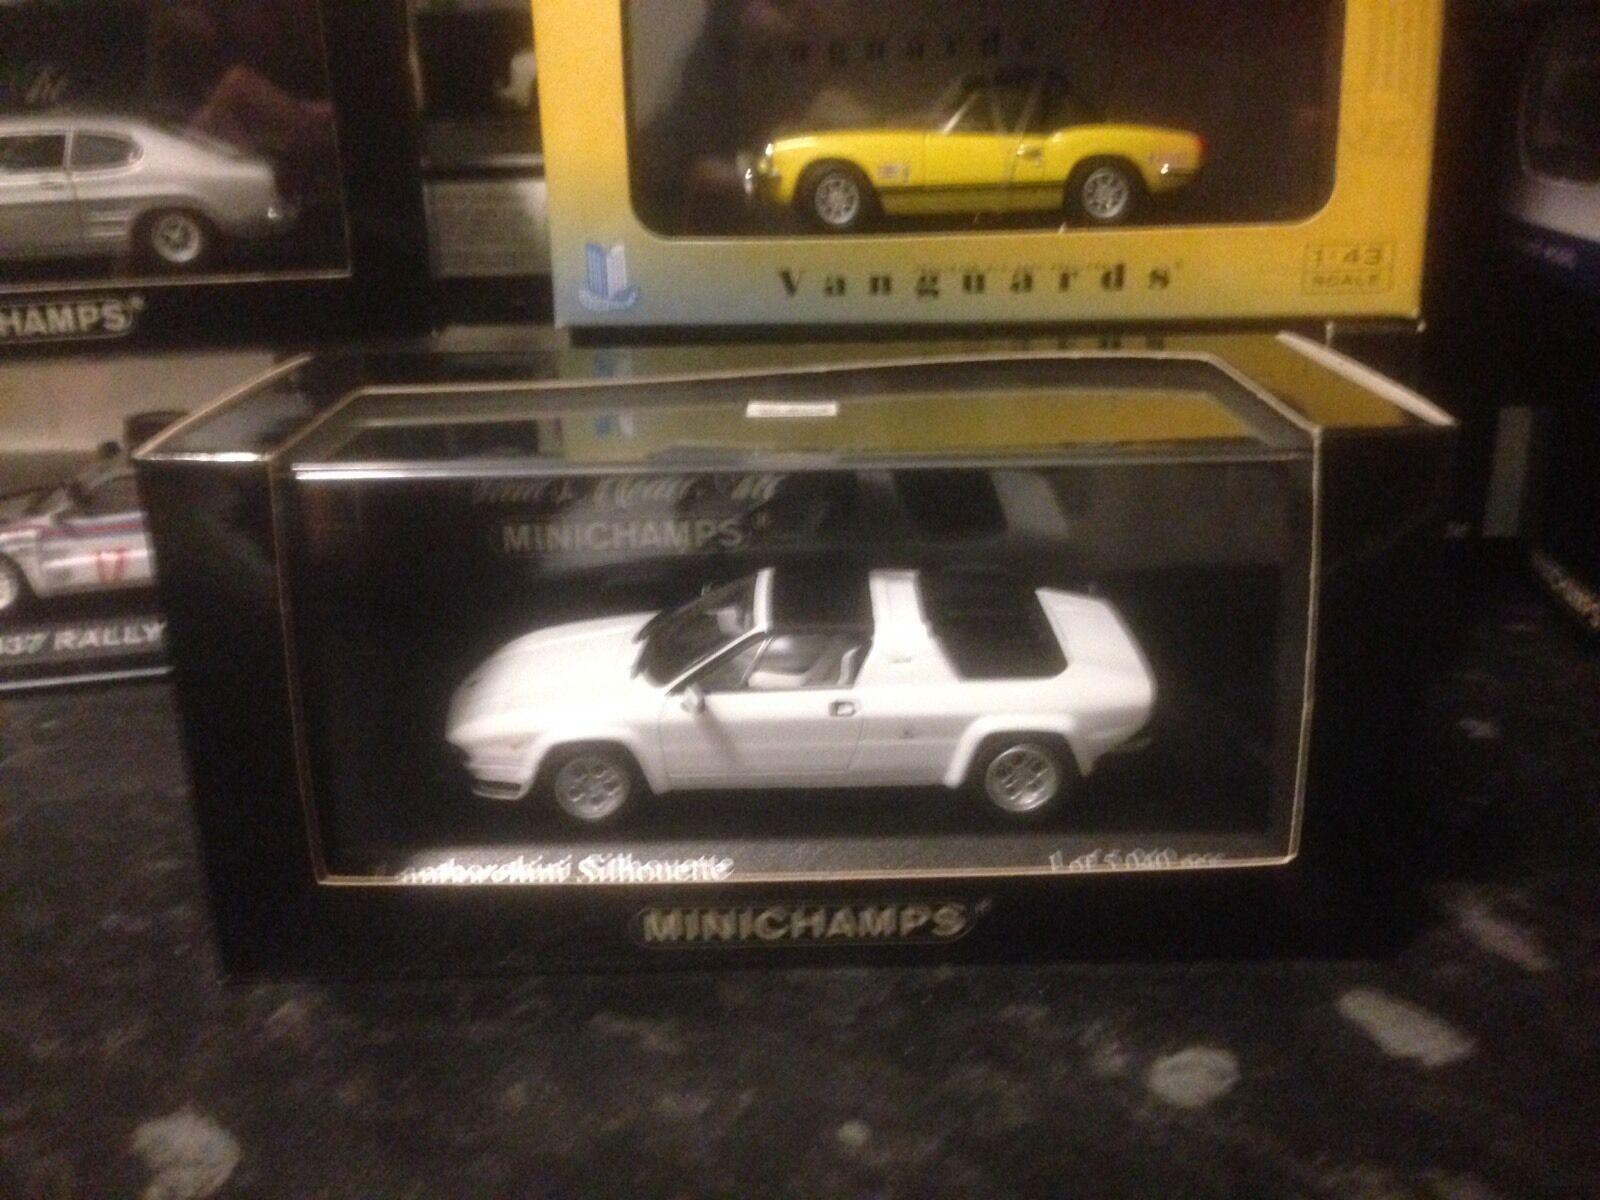 Minichamps Lamborghini Silhouette 1976 1 43 MIB Ltd Ed White